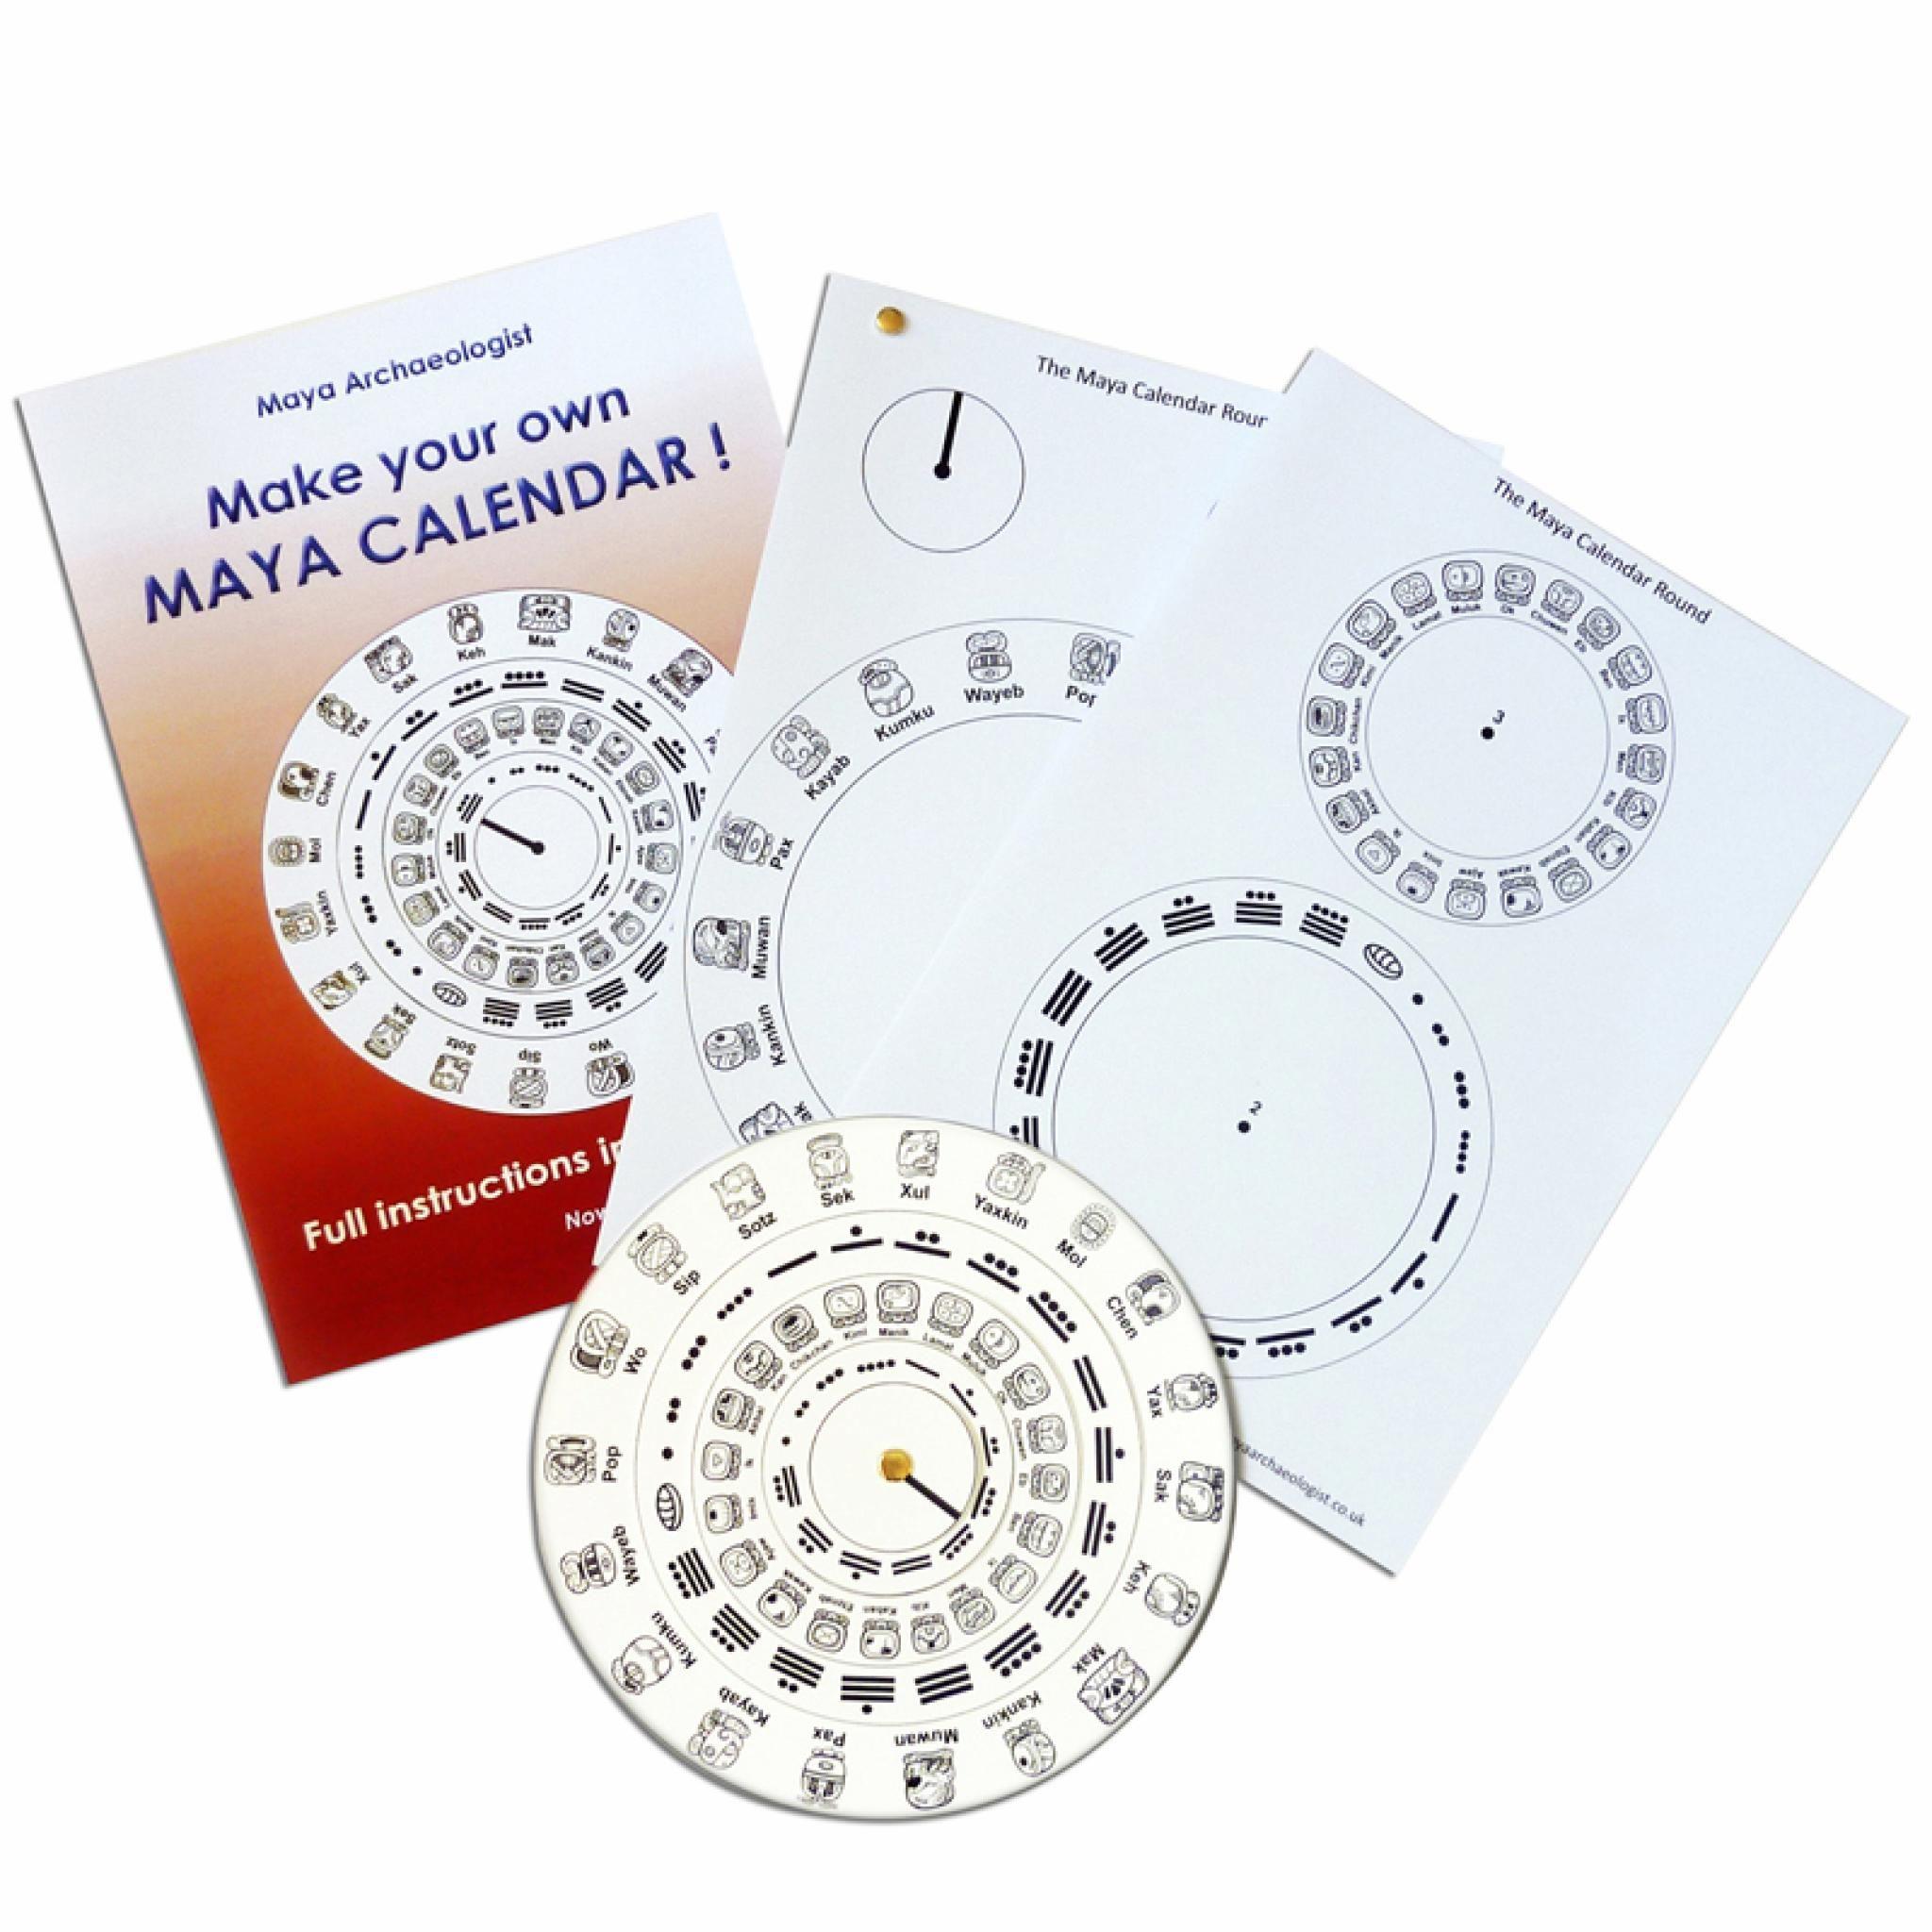 Maya Calendar | Maya, Teaching, Calendar inside How To Read A Mayan Calendar Round